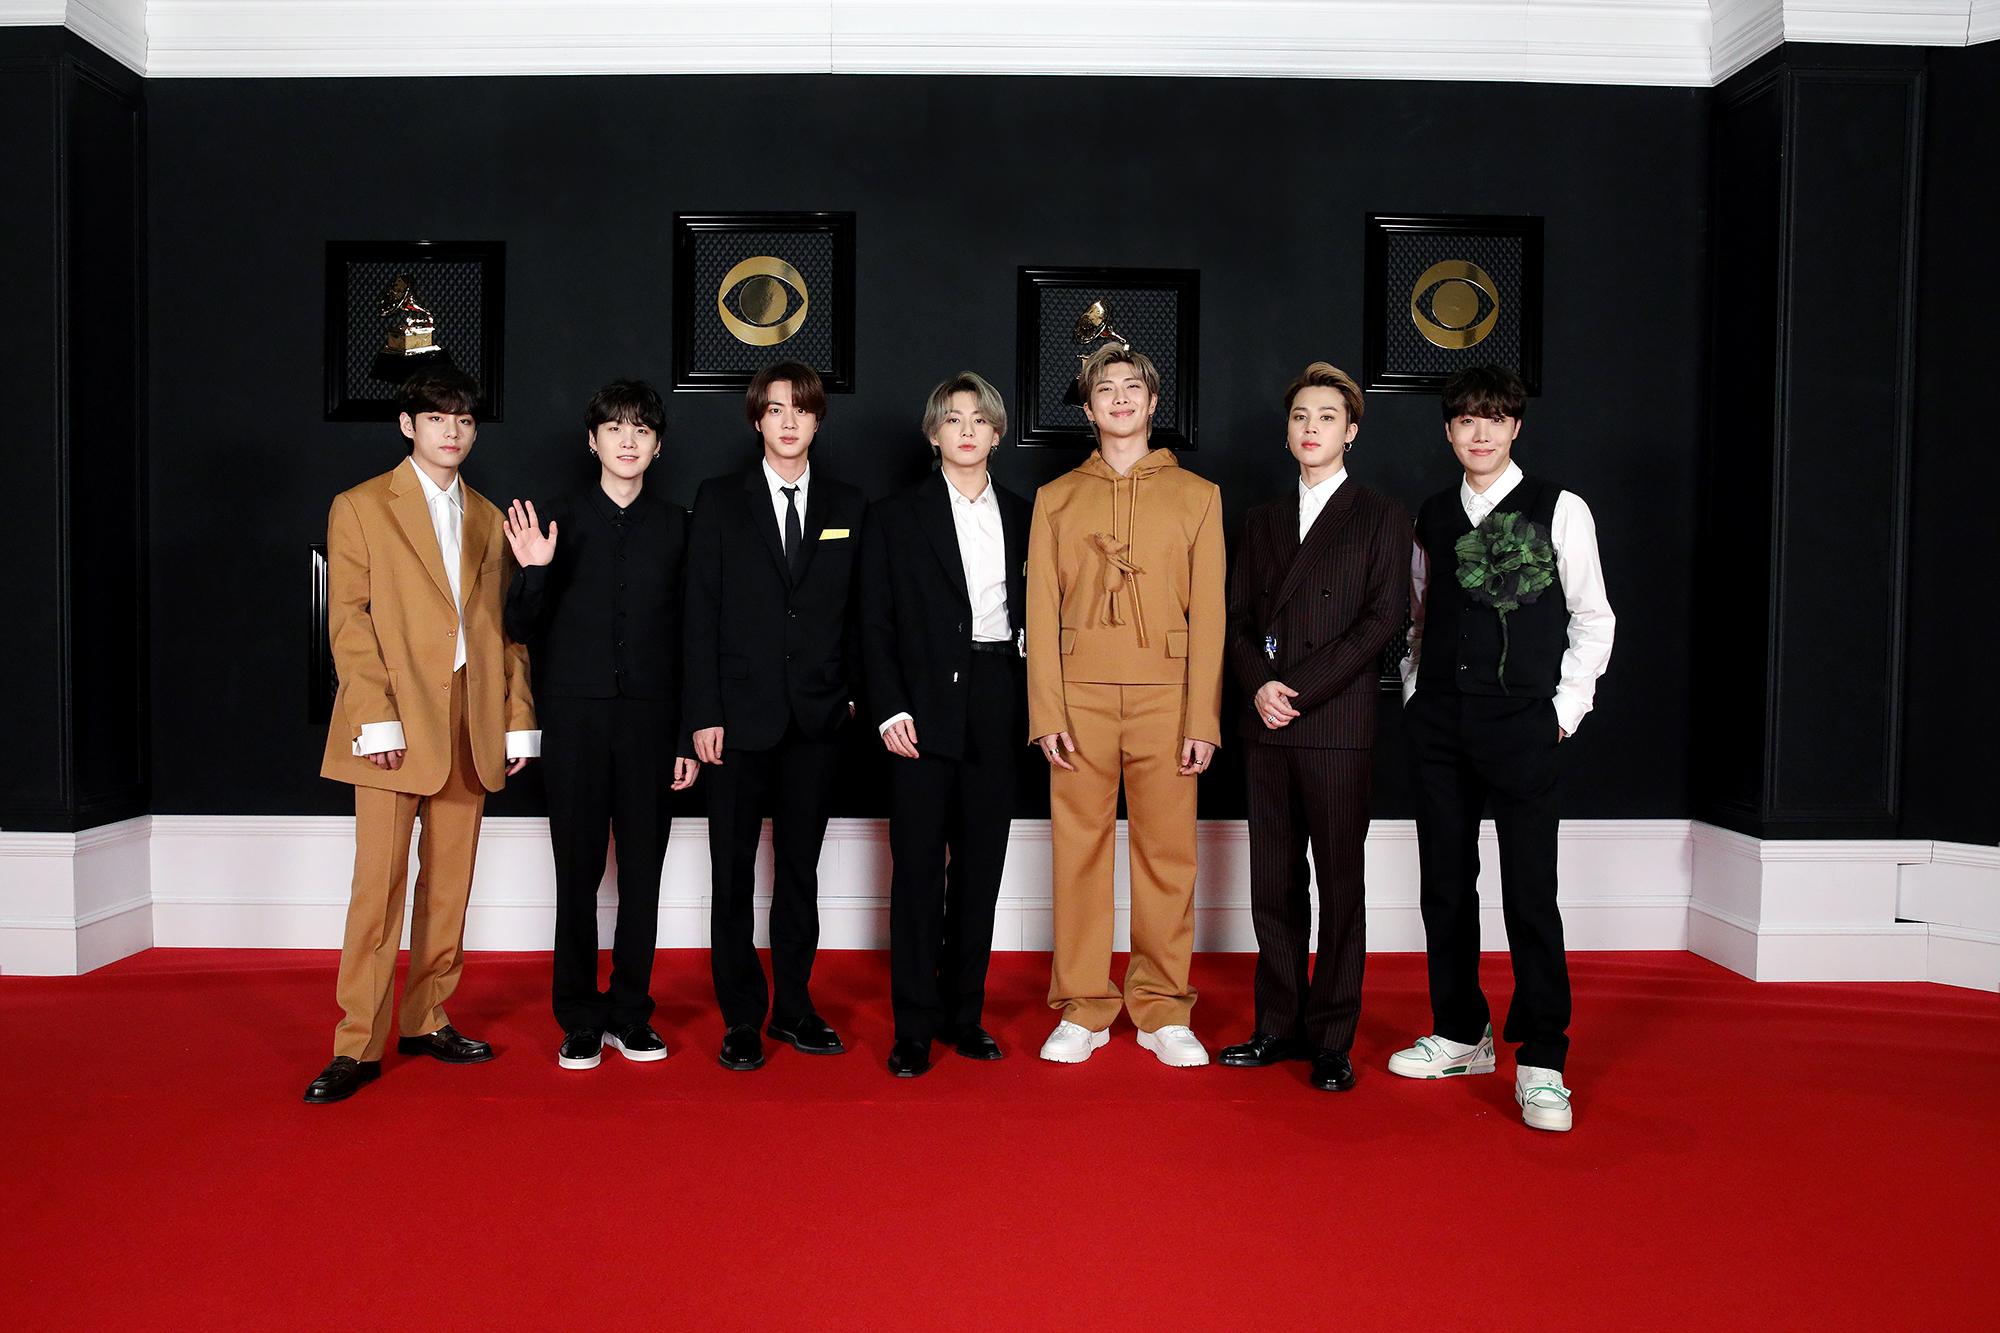 BTS in Louis Vuitton at the 2021 Grammy Awards.